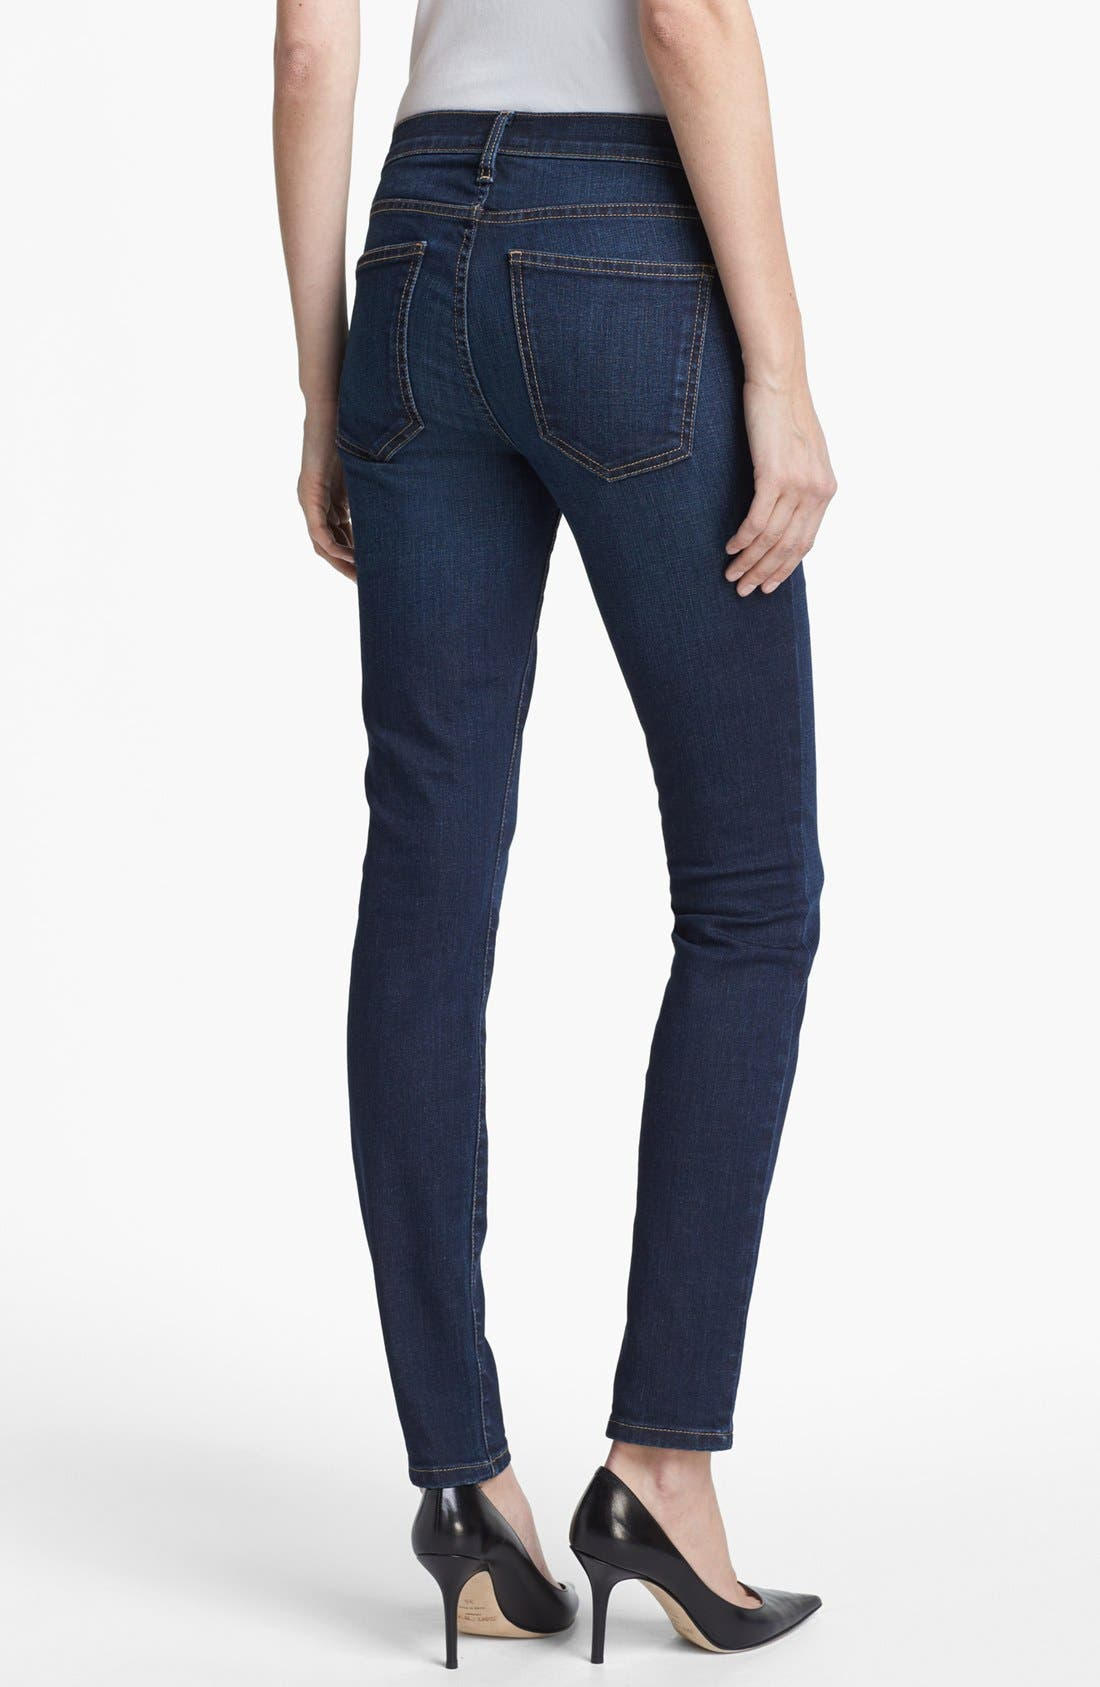 Alternate Image 3  - Current/Elliott 'The Ankle' Skinny Jeans (Nordstrom Exclusive)